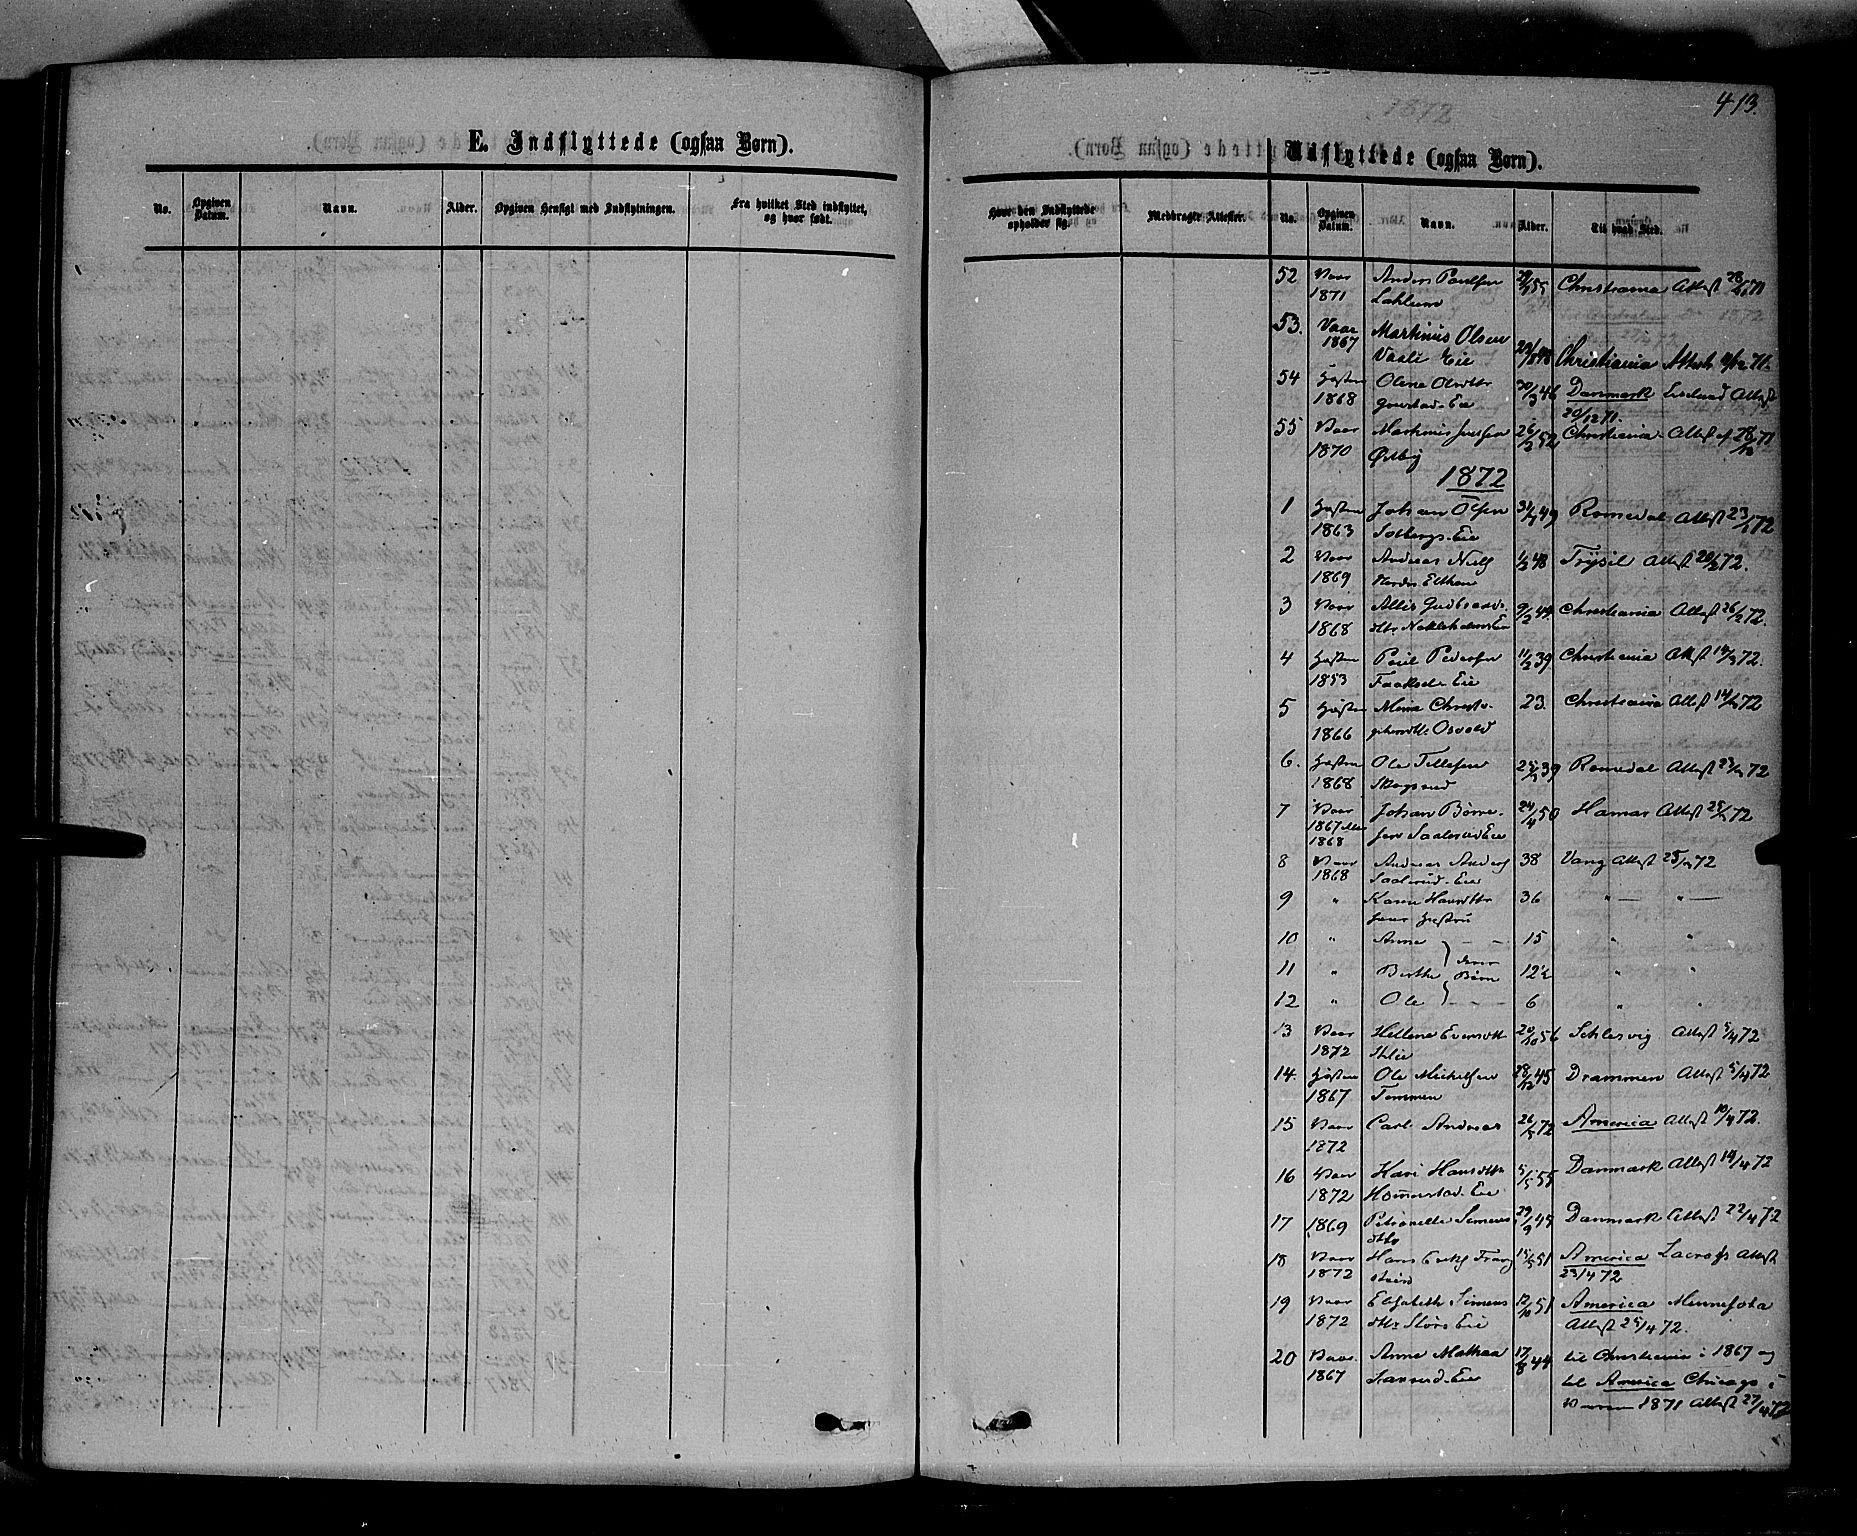 SAH, Stange prestekontor, K/L0013: Ministerialbok nr. 13, 1862-1879, s. 413